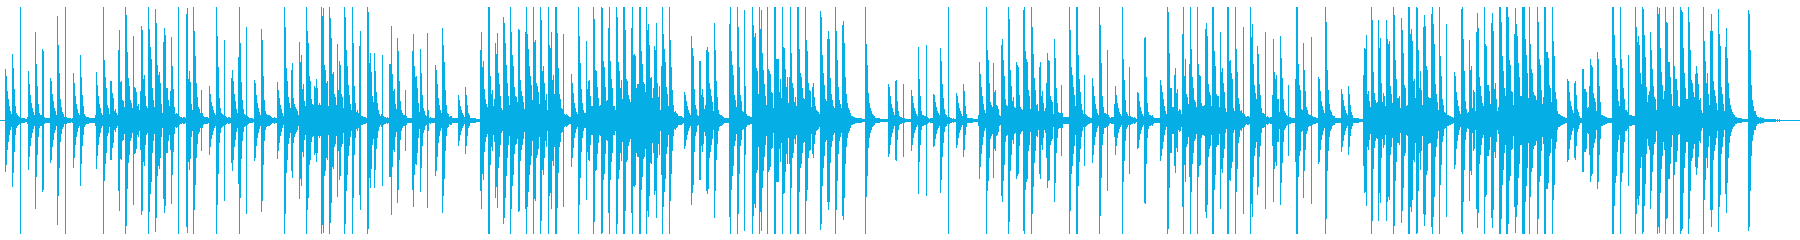 Lo-Fiで切ない『ジムノペディ 1番』の再生済みの波形